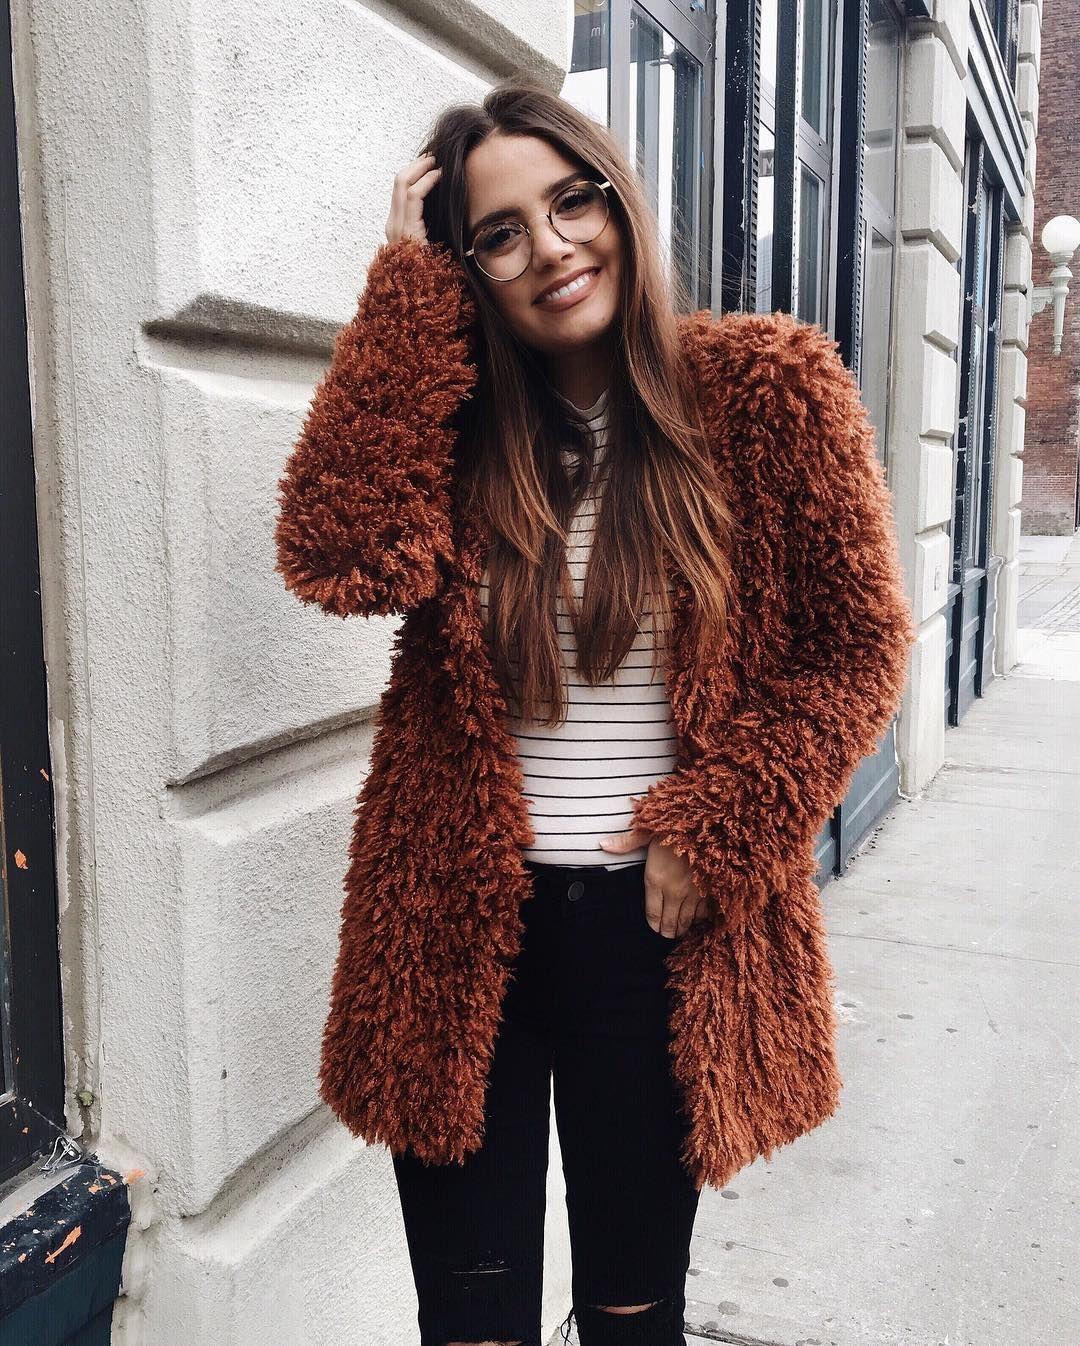 950051ed330f Fur Collar Coat · 51.6k Likes, 210 Comments - Tess Christine  (@tesschristinexo) on Instagram: